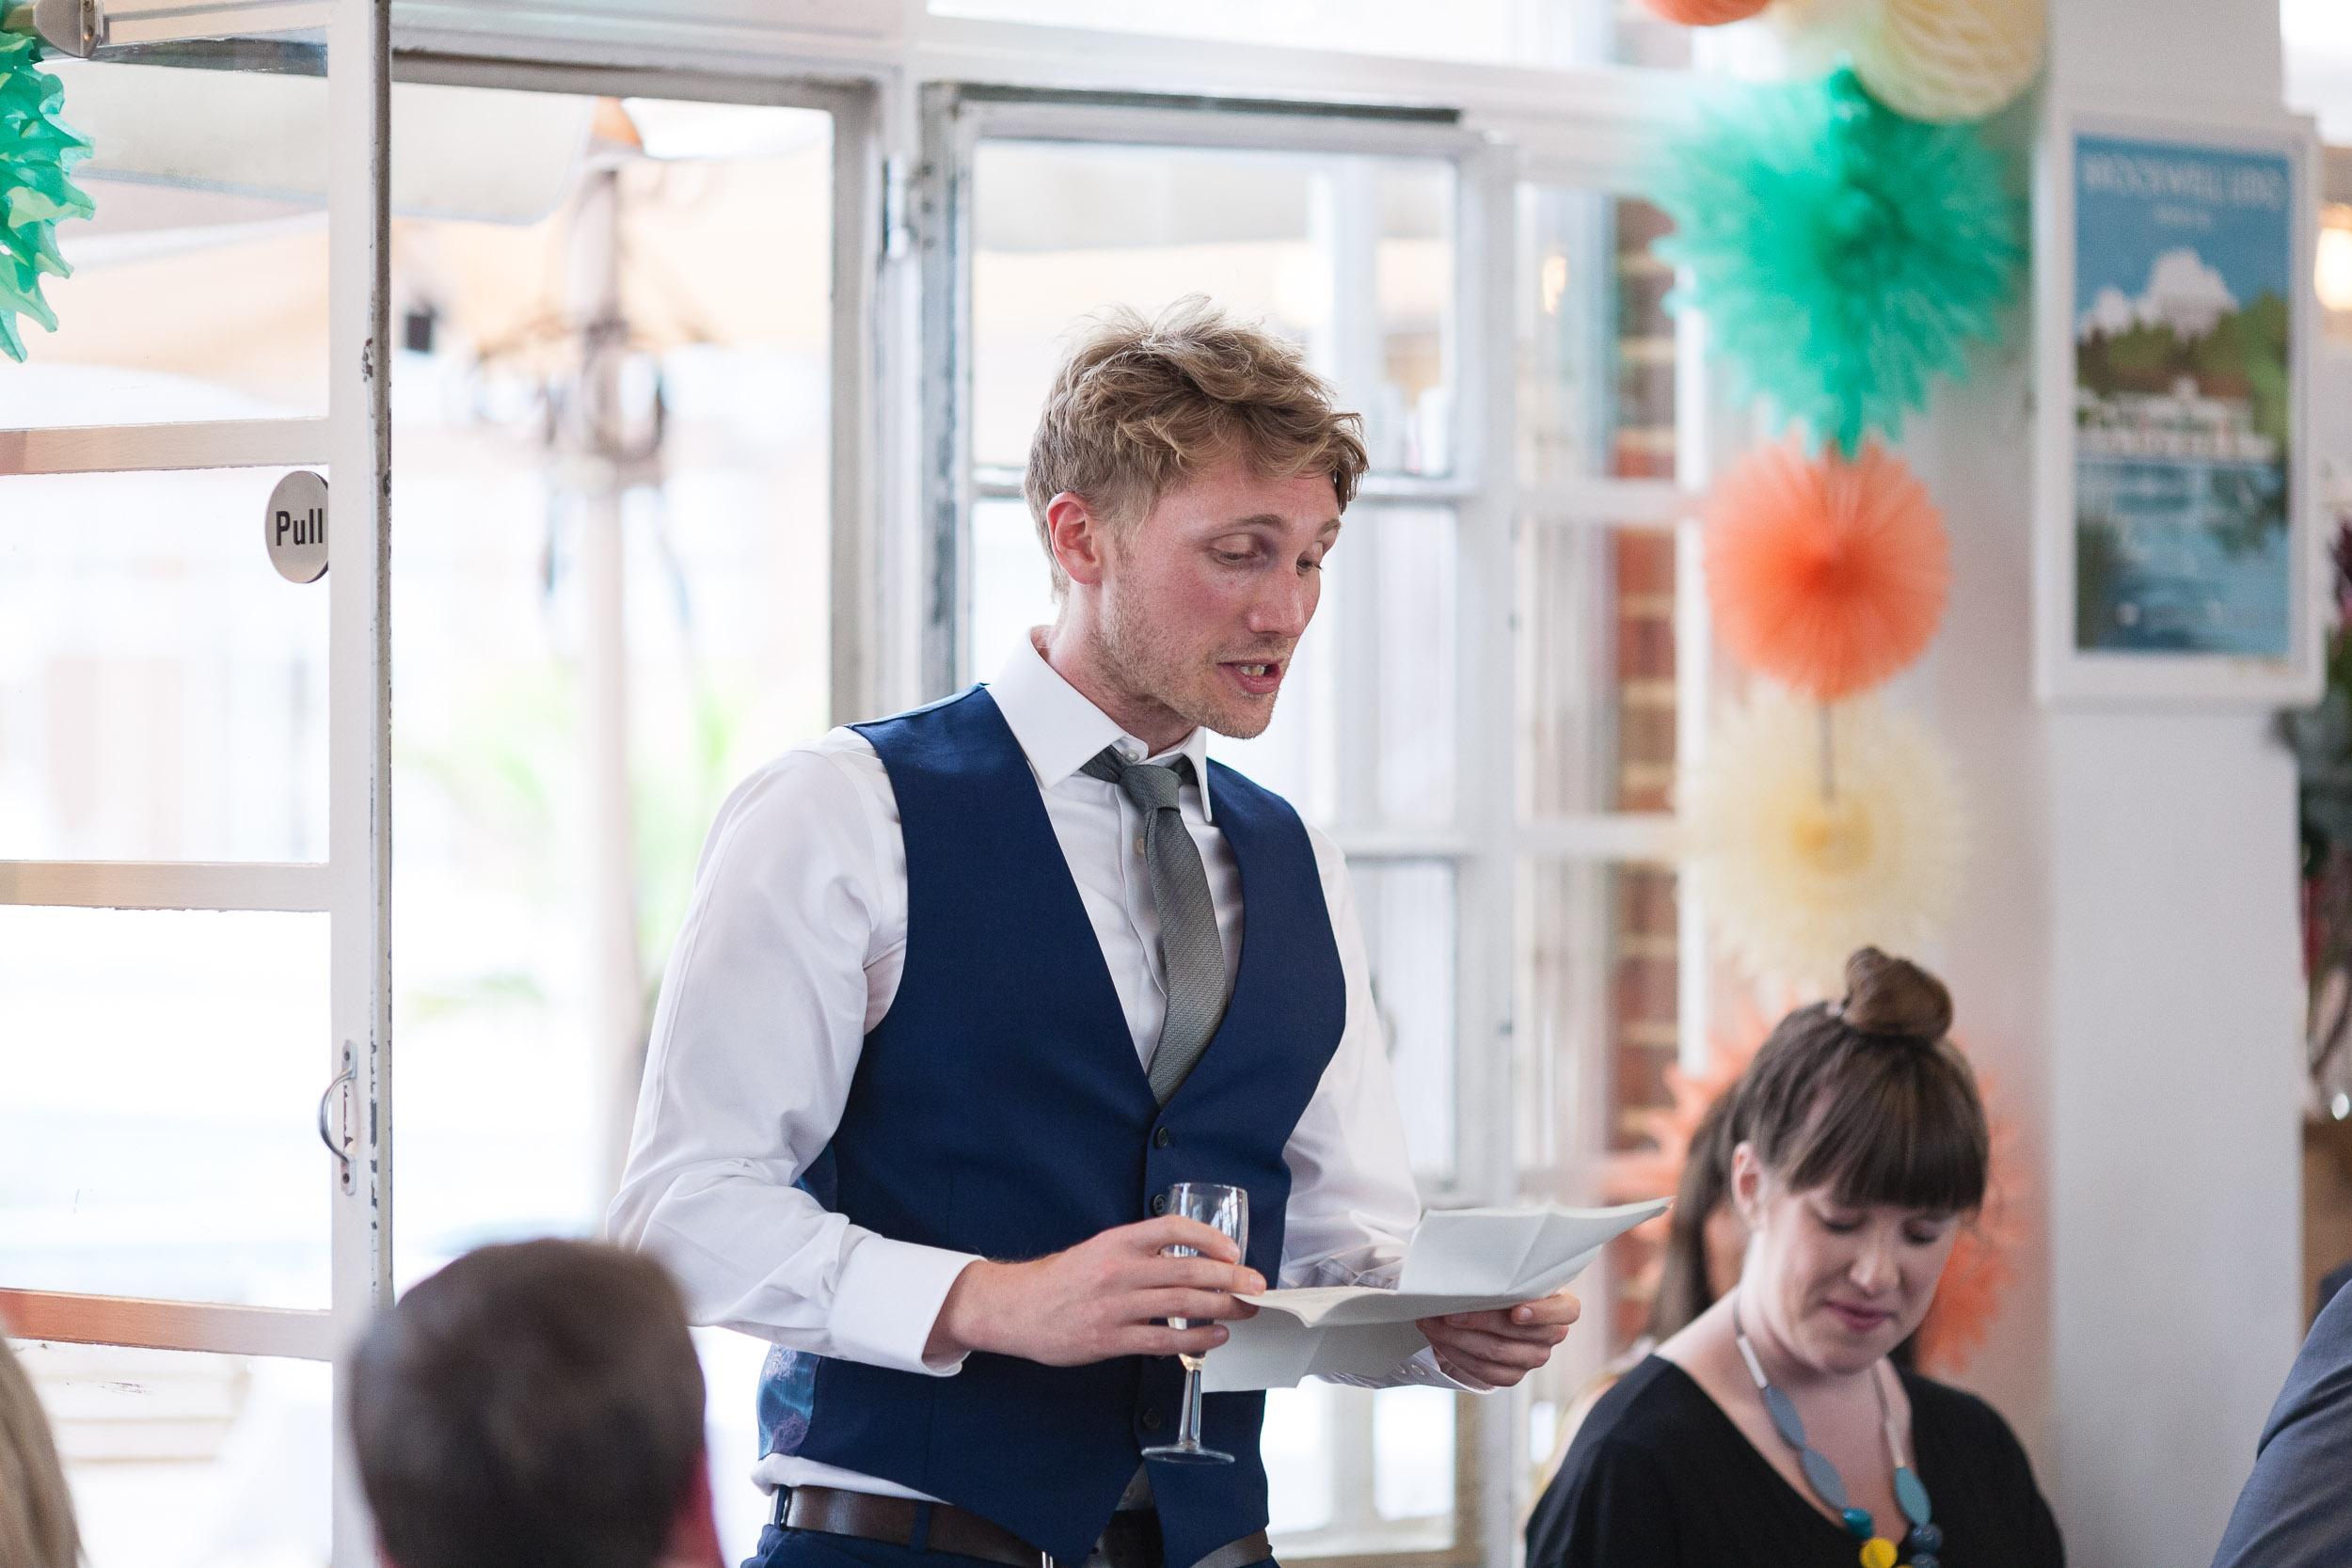 brockwell-lido-brixton-herne-hill-wedding-356.jpg